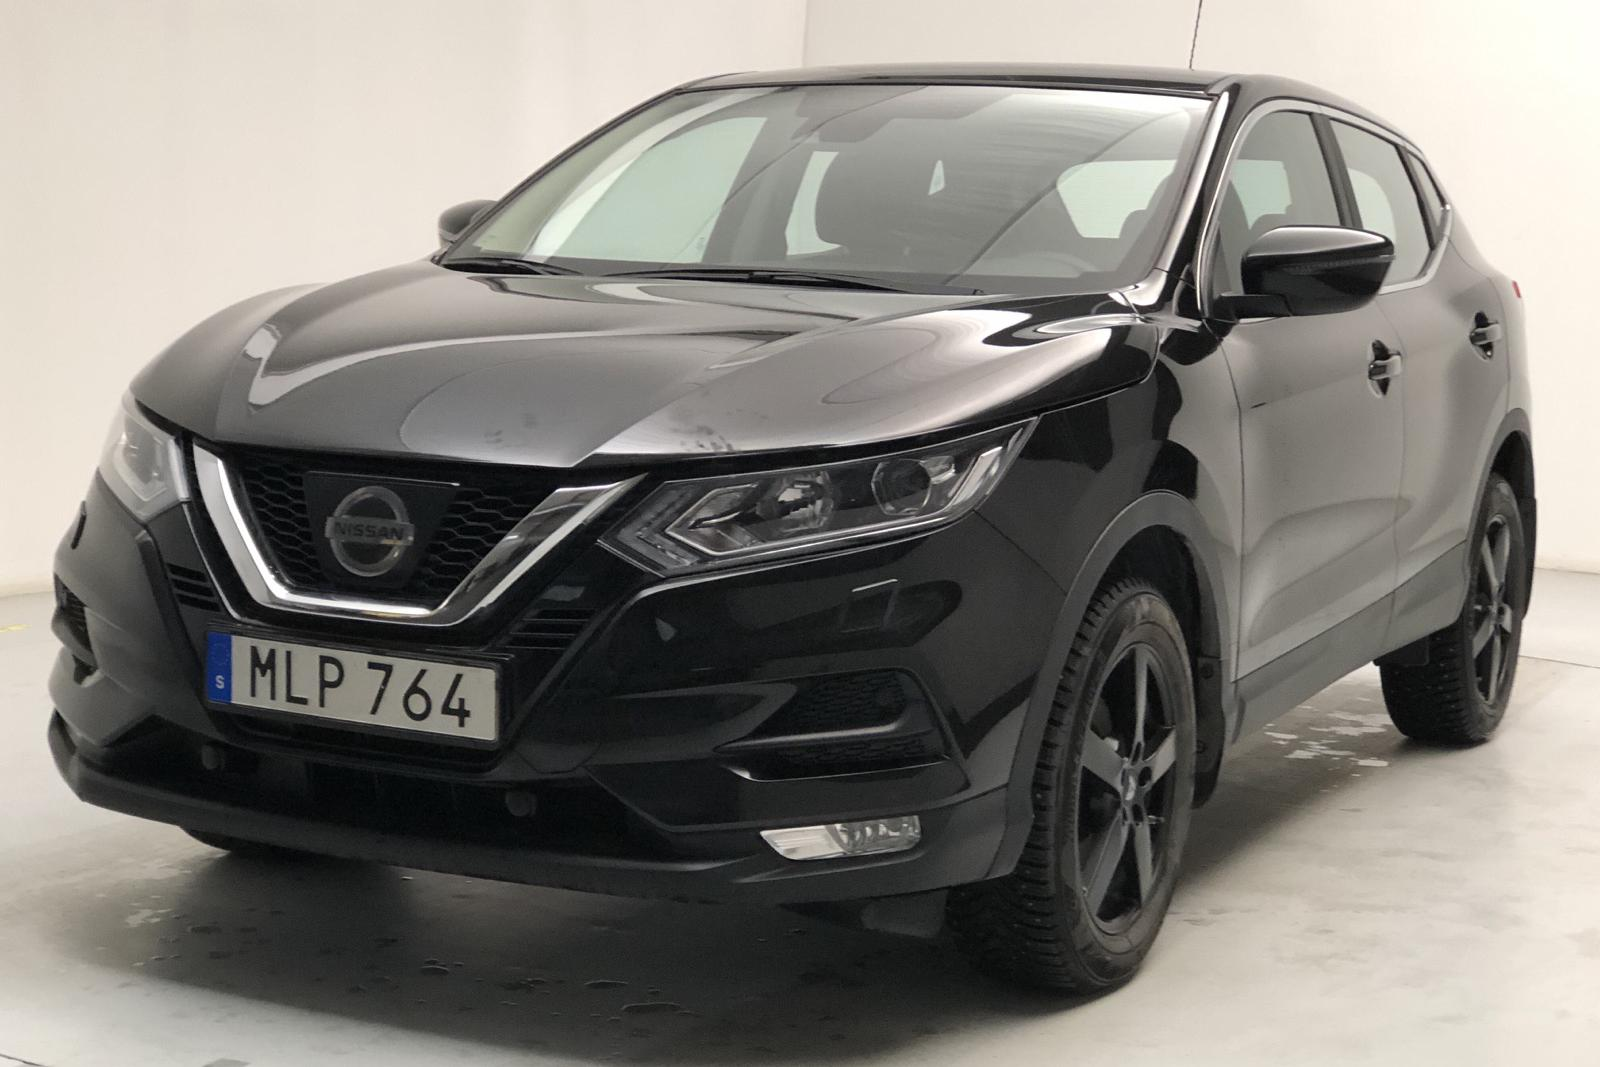 Nissan Qashqai 1.2 DIG-T (115hk) - 22 870 km - Manual - black - 2018